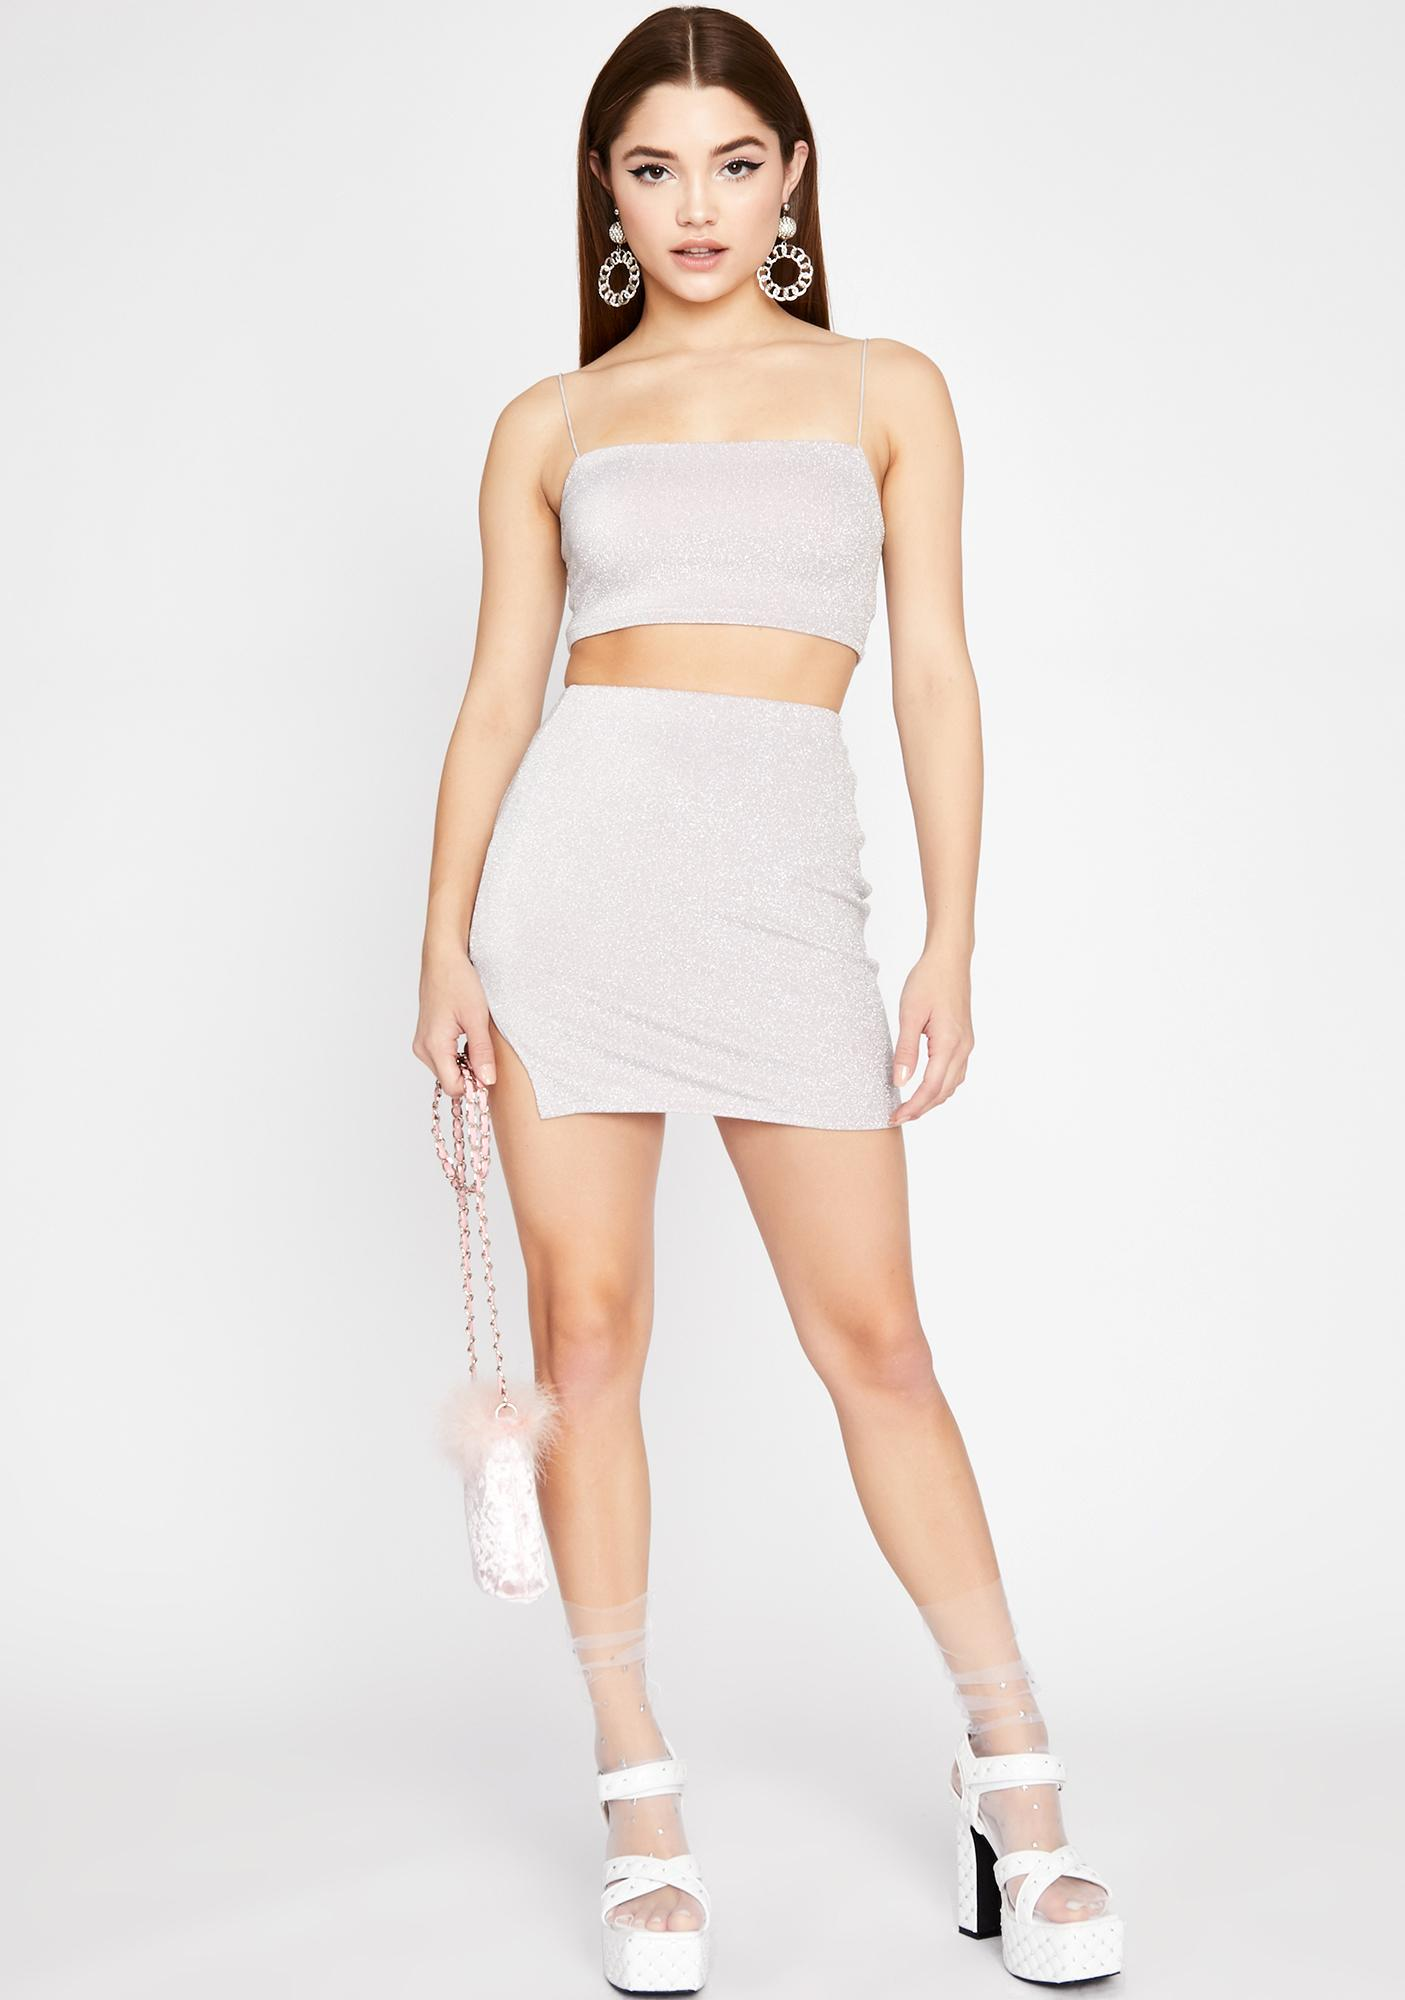 Baby Come Round Skirt Set